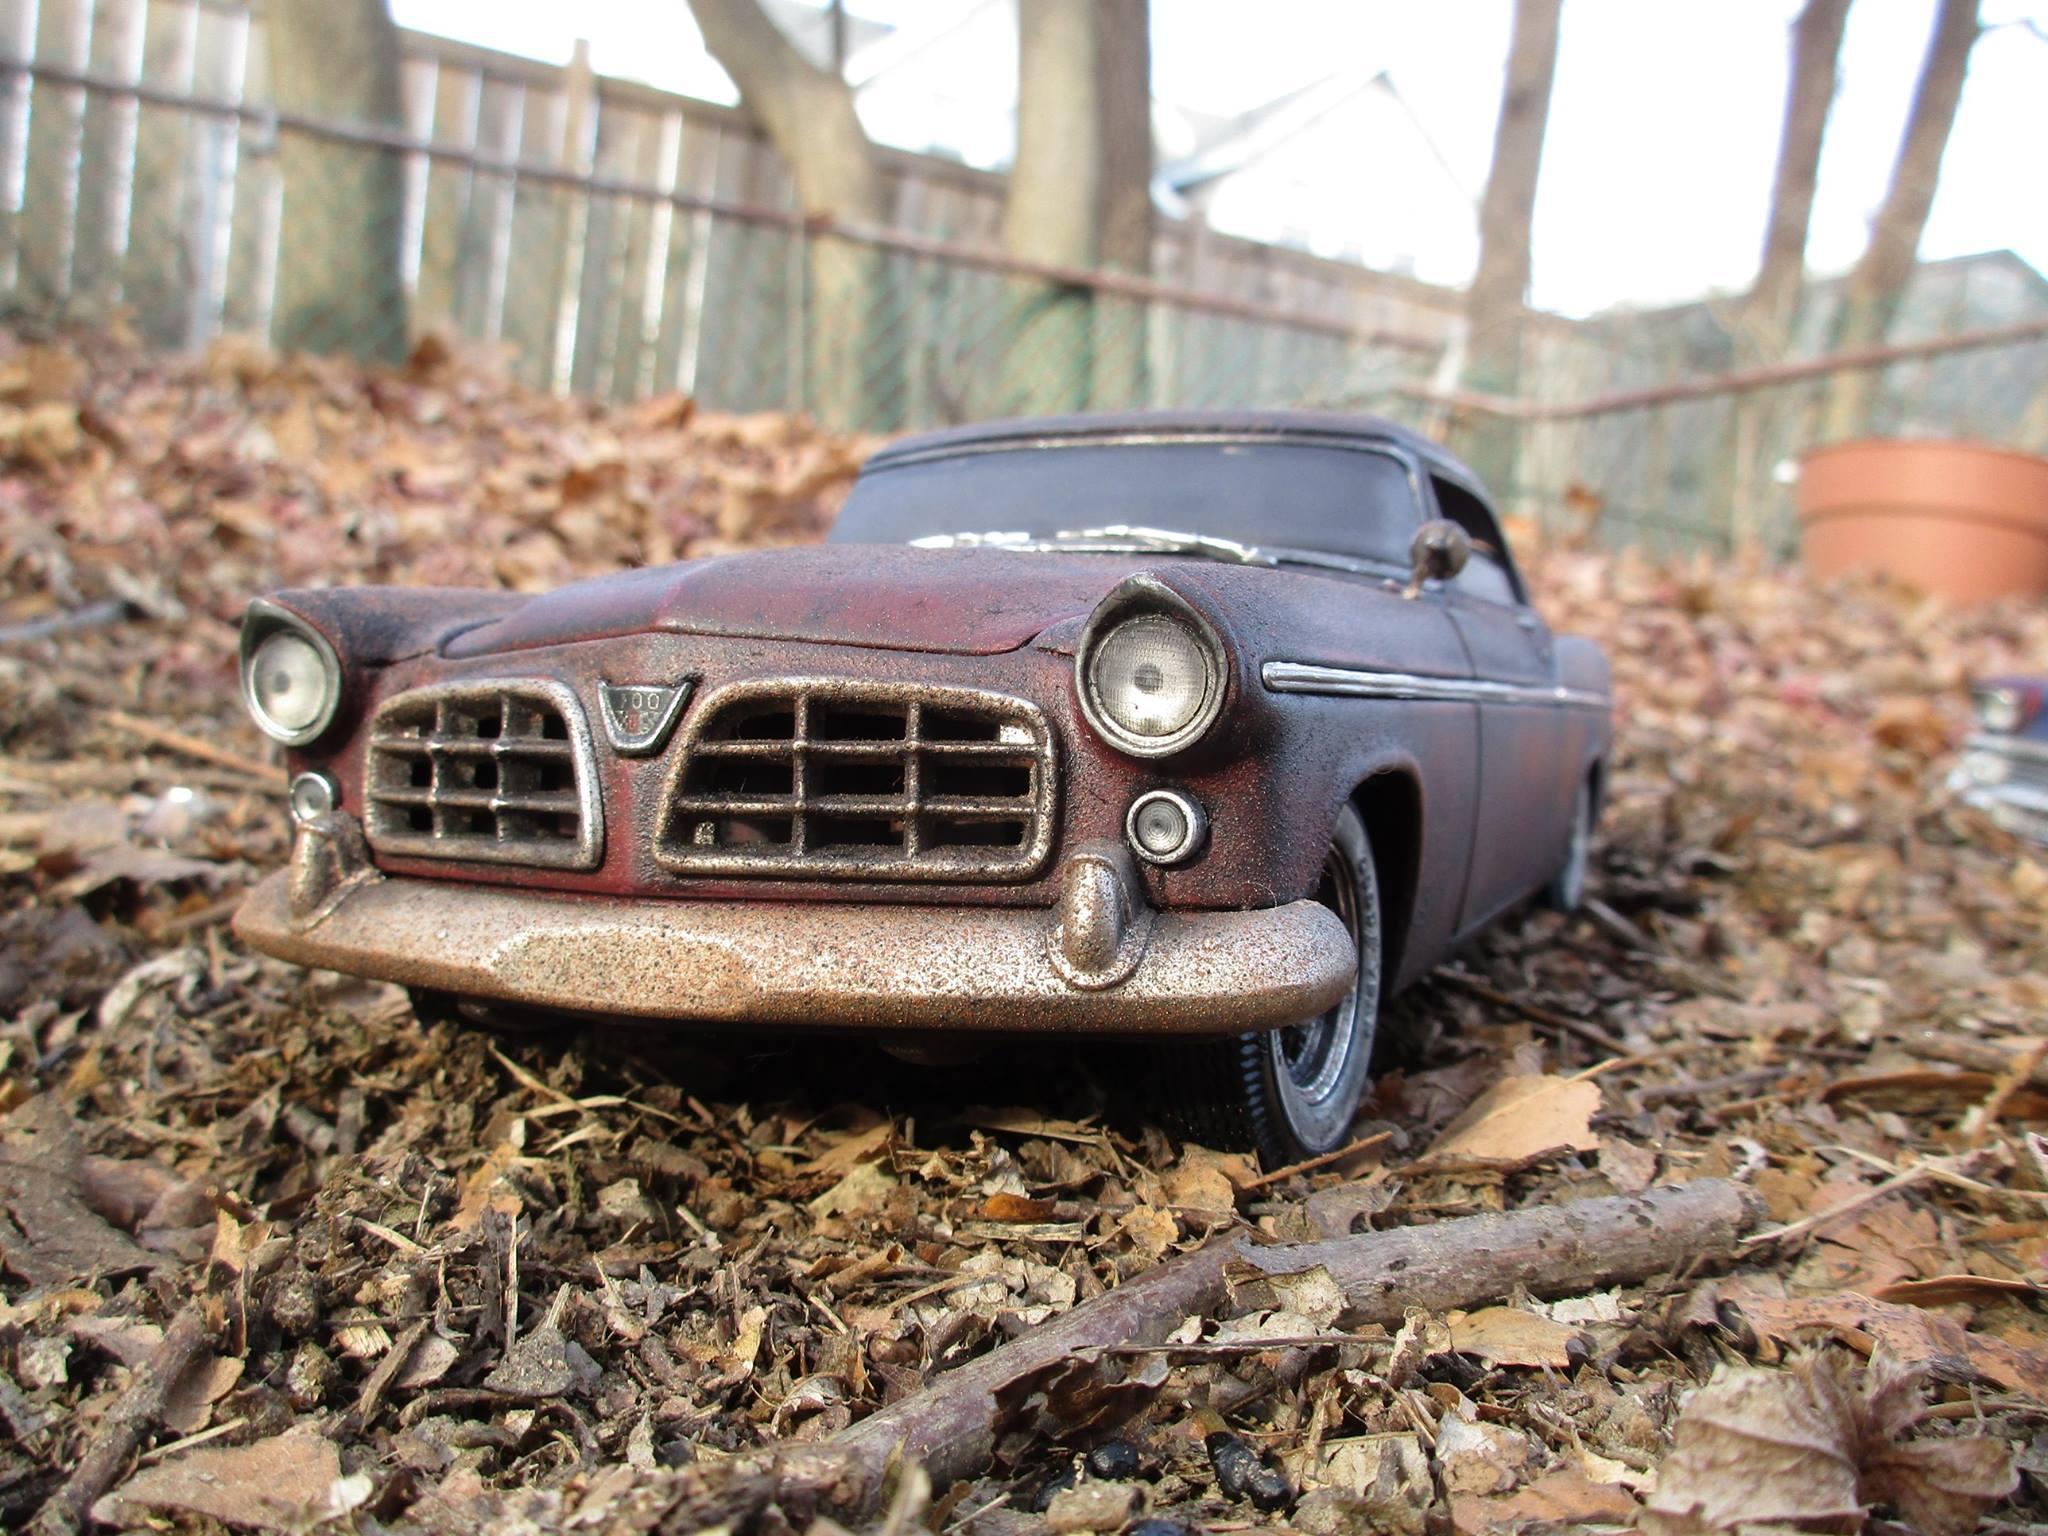 Barn-Find-Weathered-1956-Chrysler-300-118--1